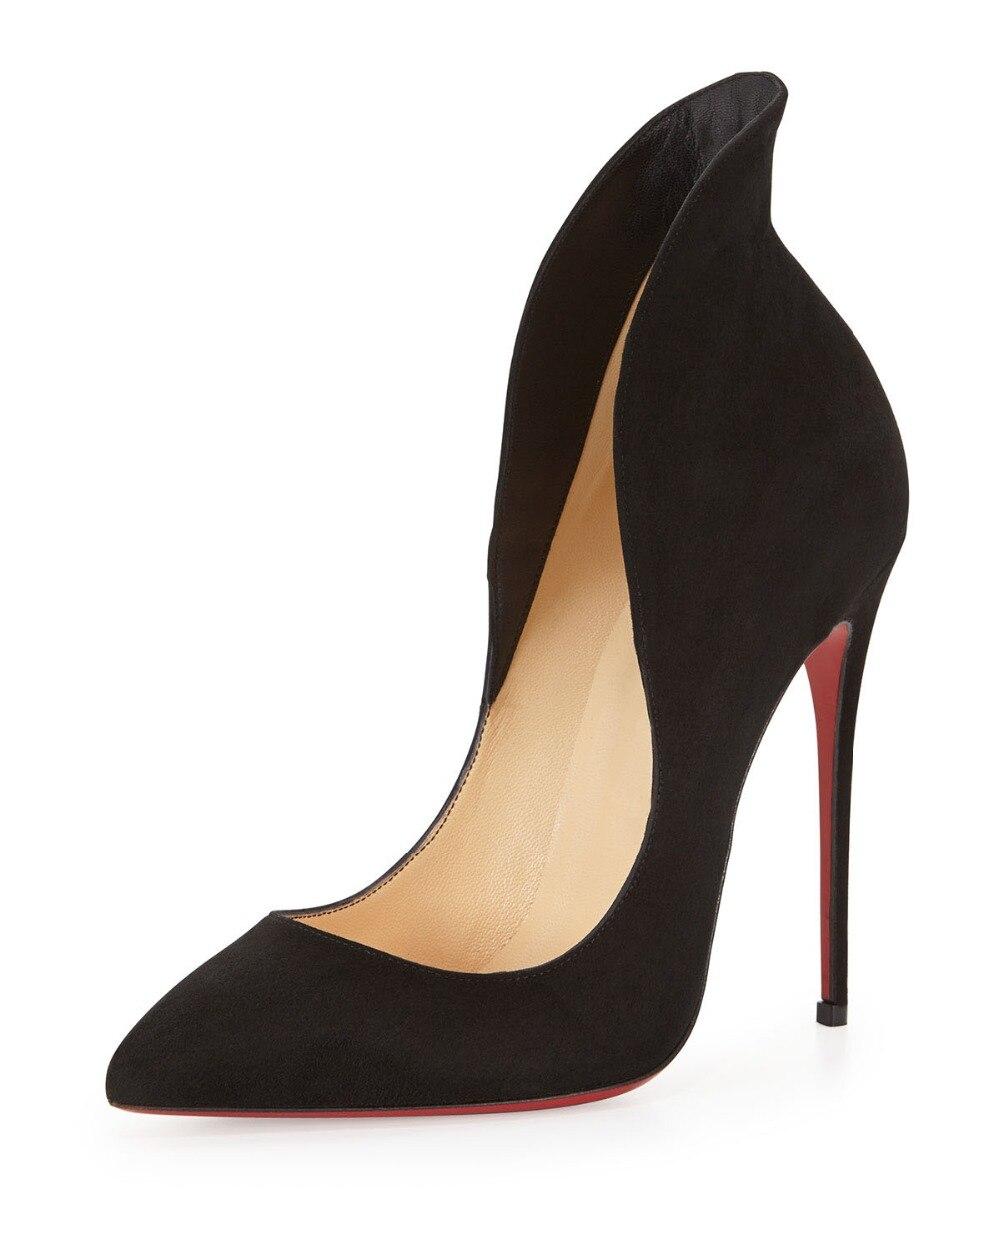 ФОТО ZK women fashion sexy high heels pointed toe pumps shoes EU size 34--45